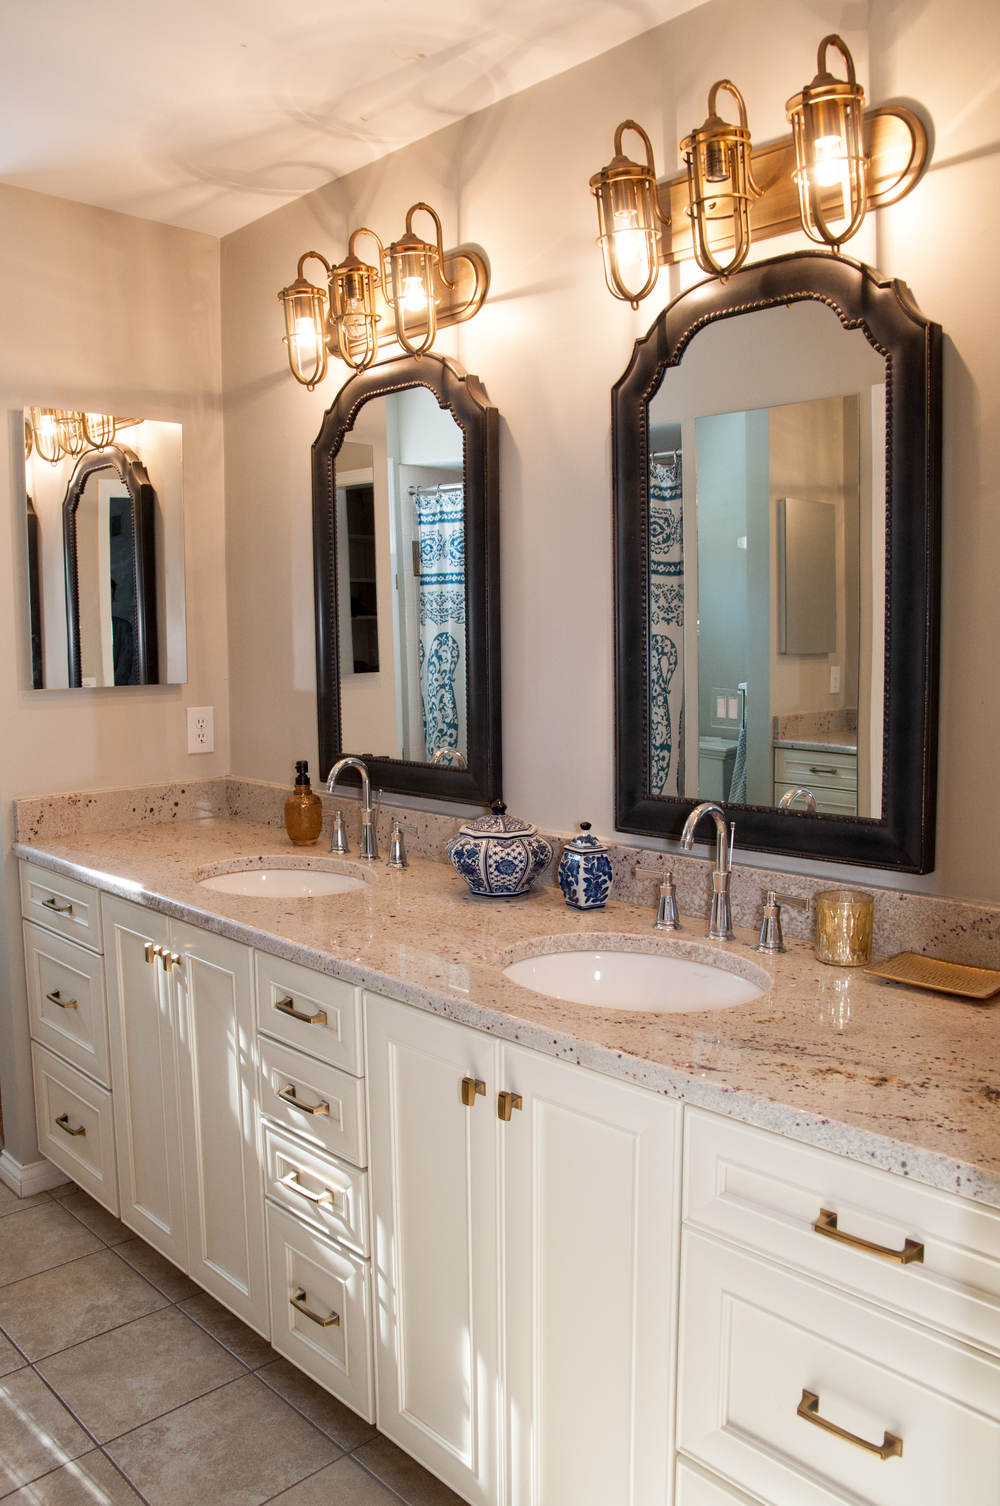 Bathroom Remodeling, Home Construction: Cincinnati, OH